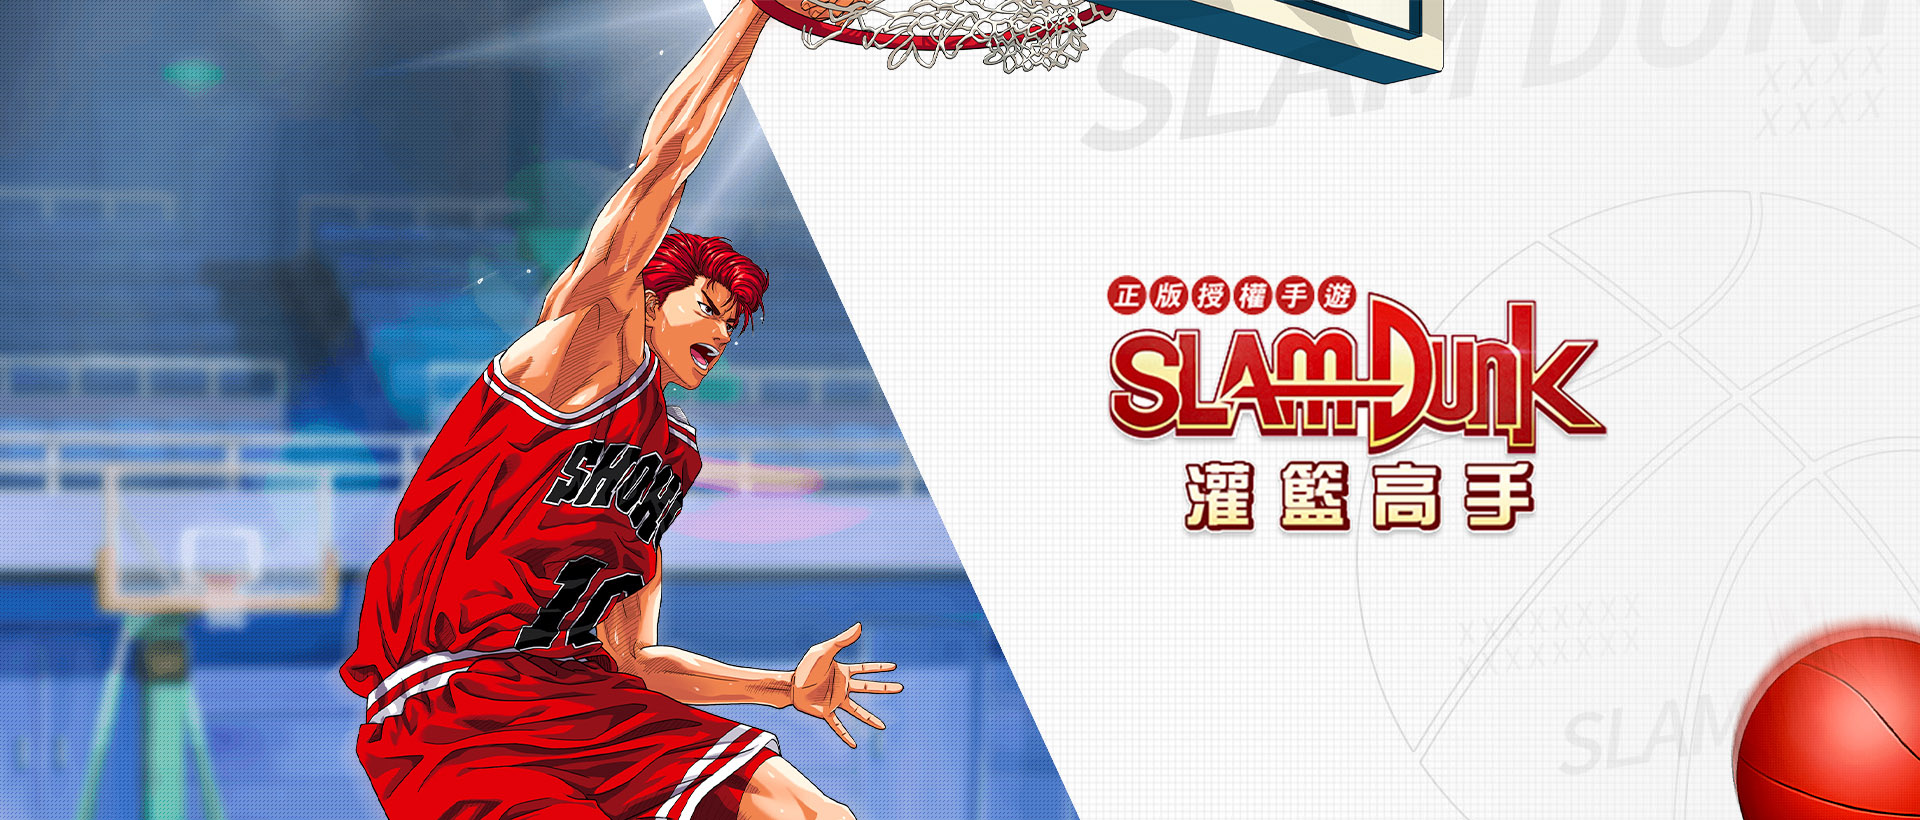 灌籃高手 SLAM DUNK